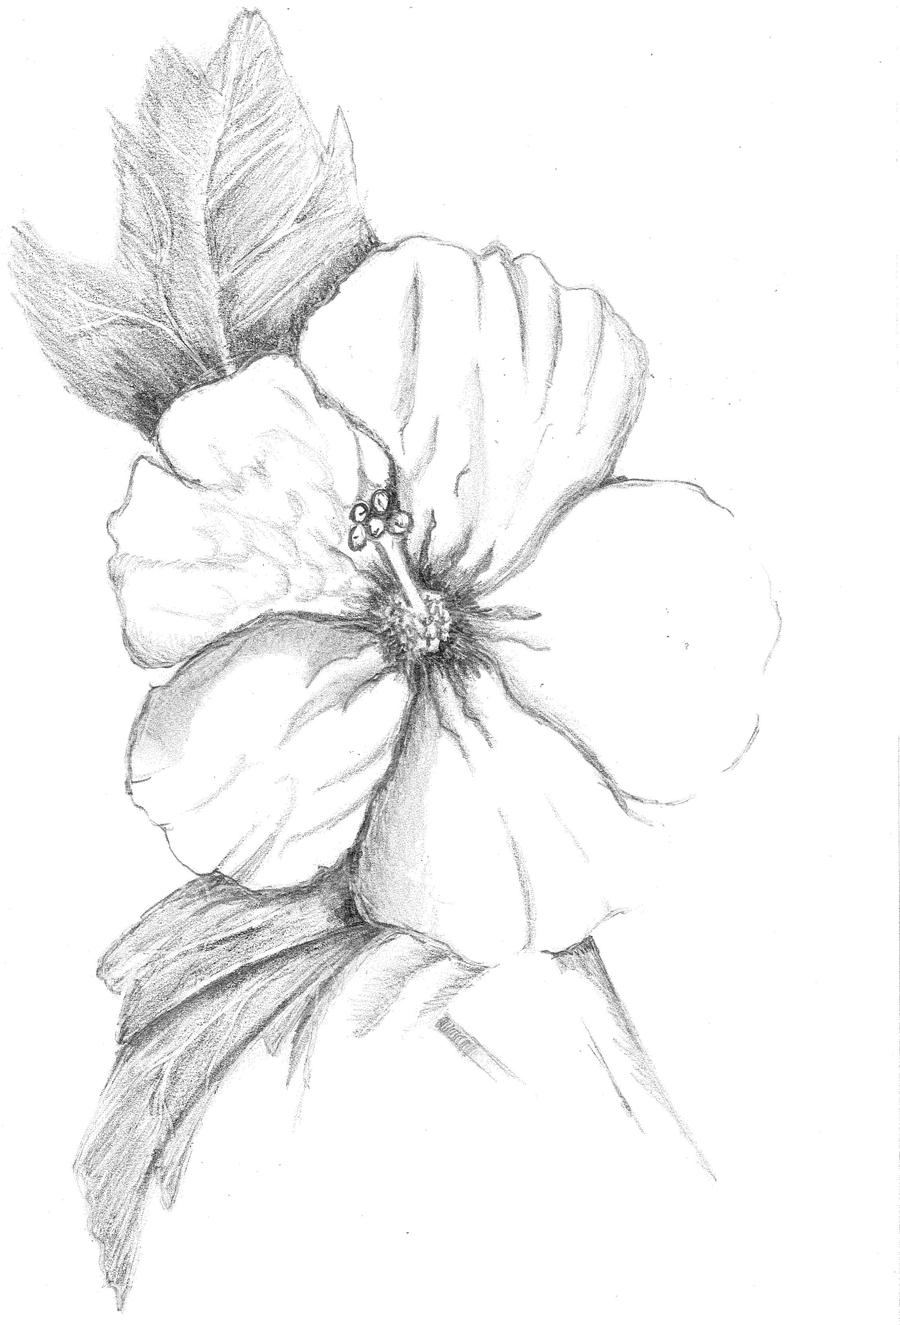 Hibiscus flower by josephnorris on deviantart hibiscus flower by josephnorris hibiscus flower by josephnorris izmirmasajfo